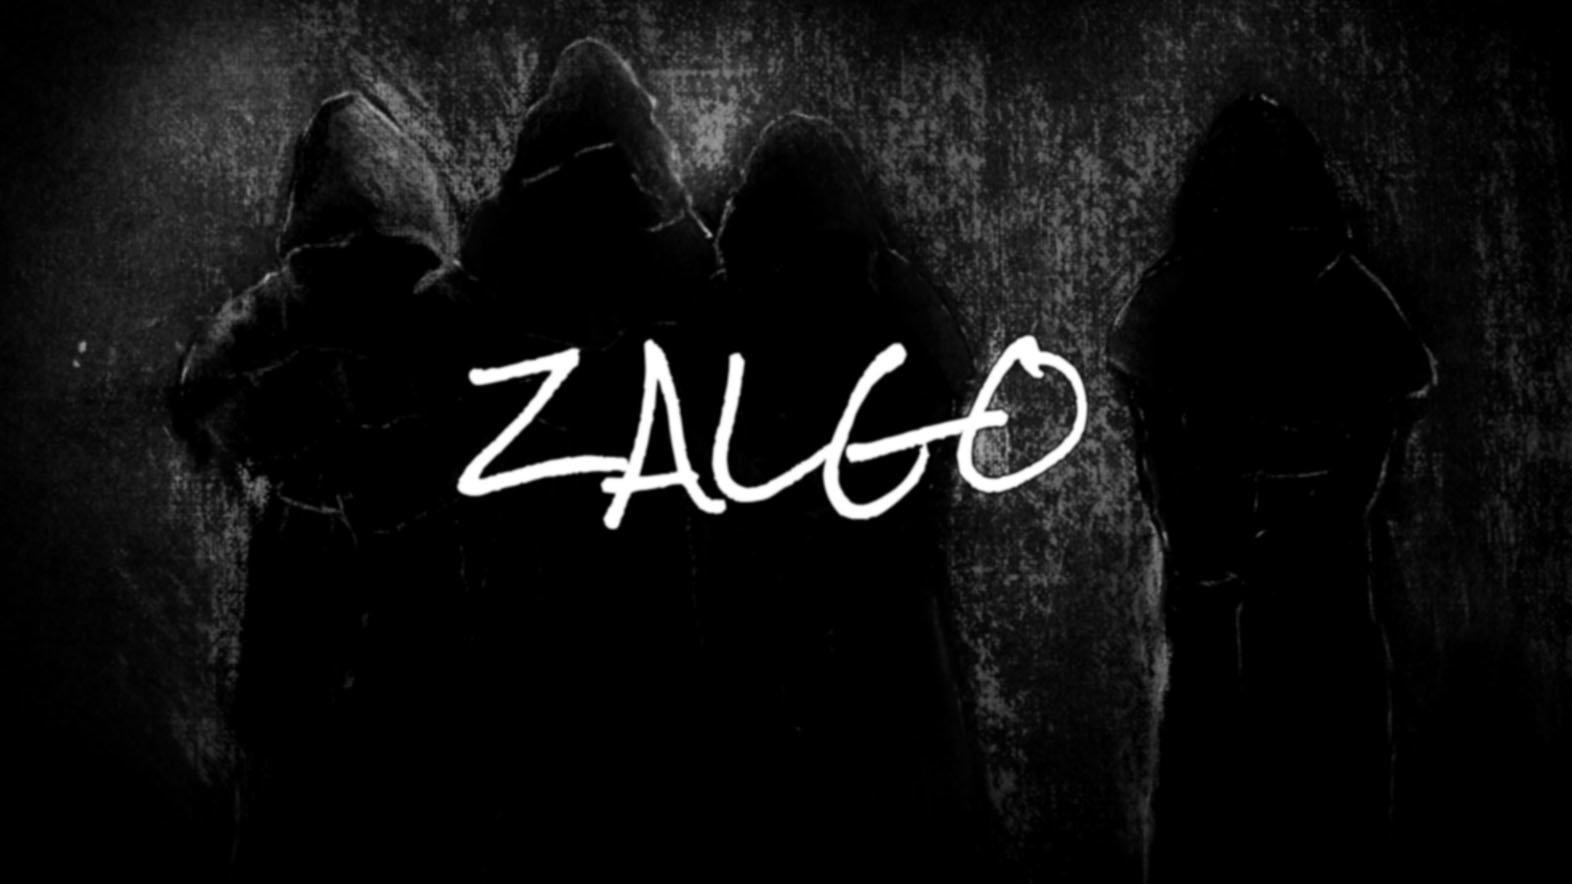 Zalgo Image Gallery  Know Your Meme